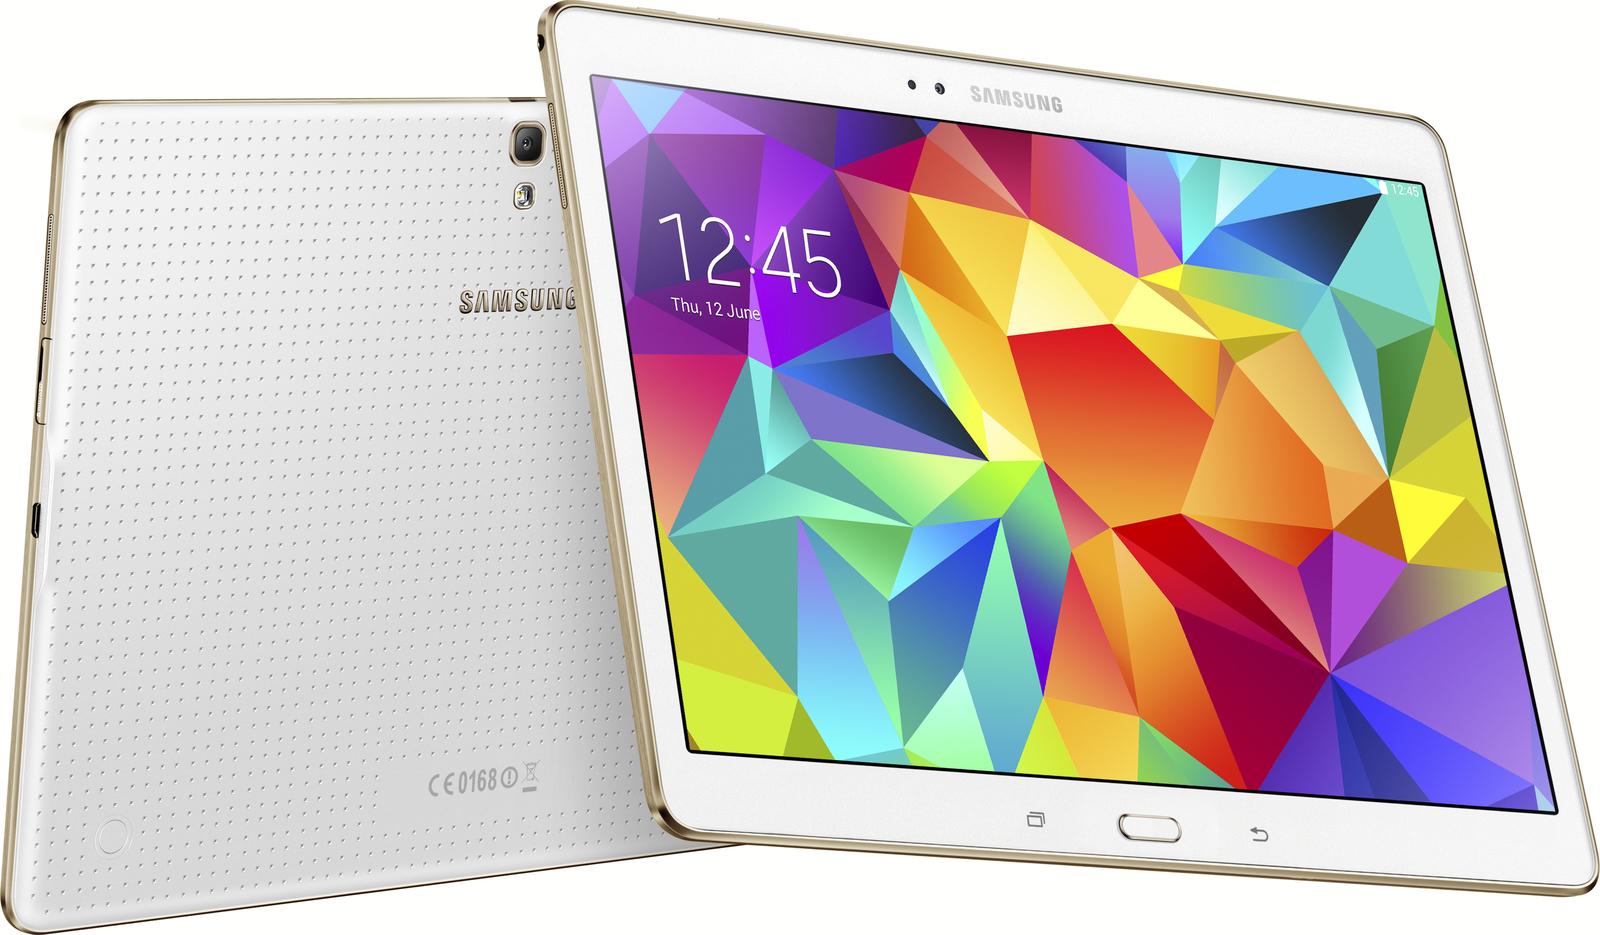 Samsung Galaxy Tab S 10.5 LTE (16GB)  Skroutz.gr